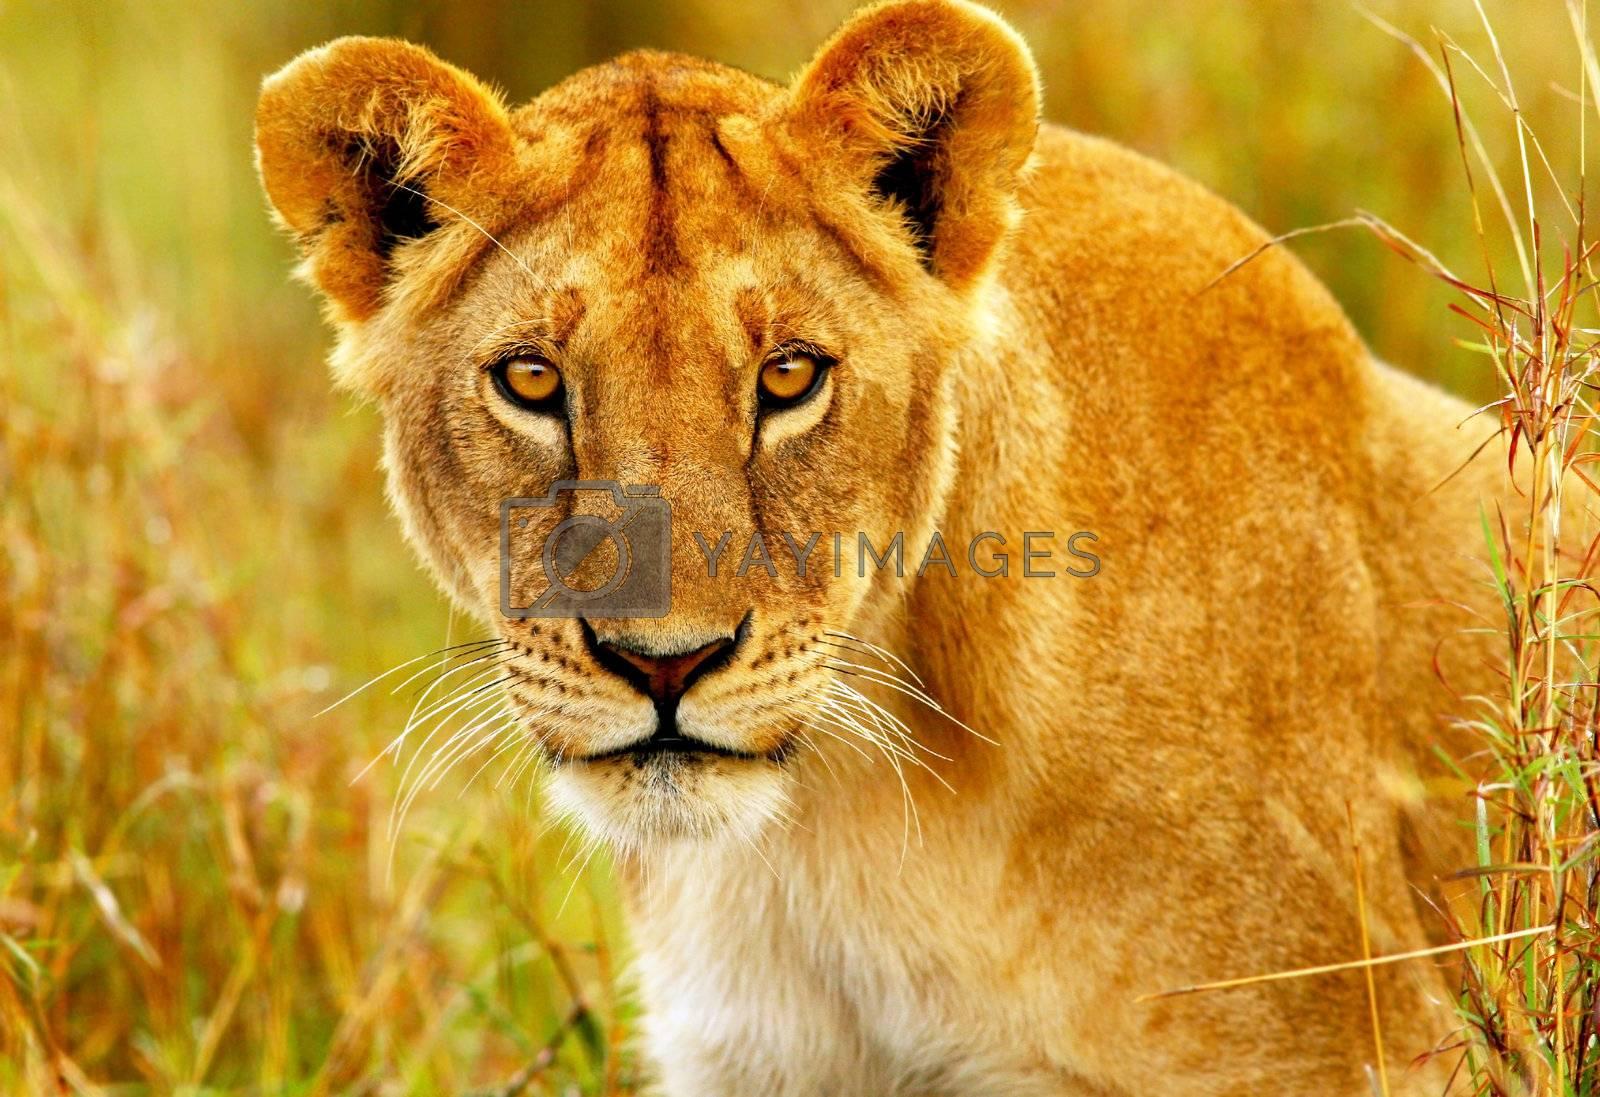 Beautiful wild african lioness portrait, Savanna, game drive, wildlife safari, animals in natural habitat, beauty of nature, Kenya travel, Masai Mara